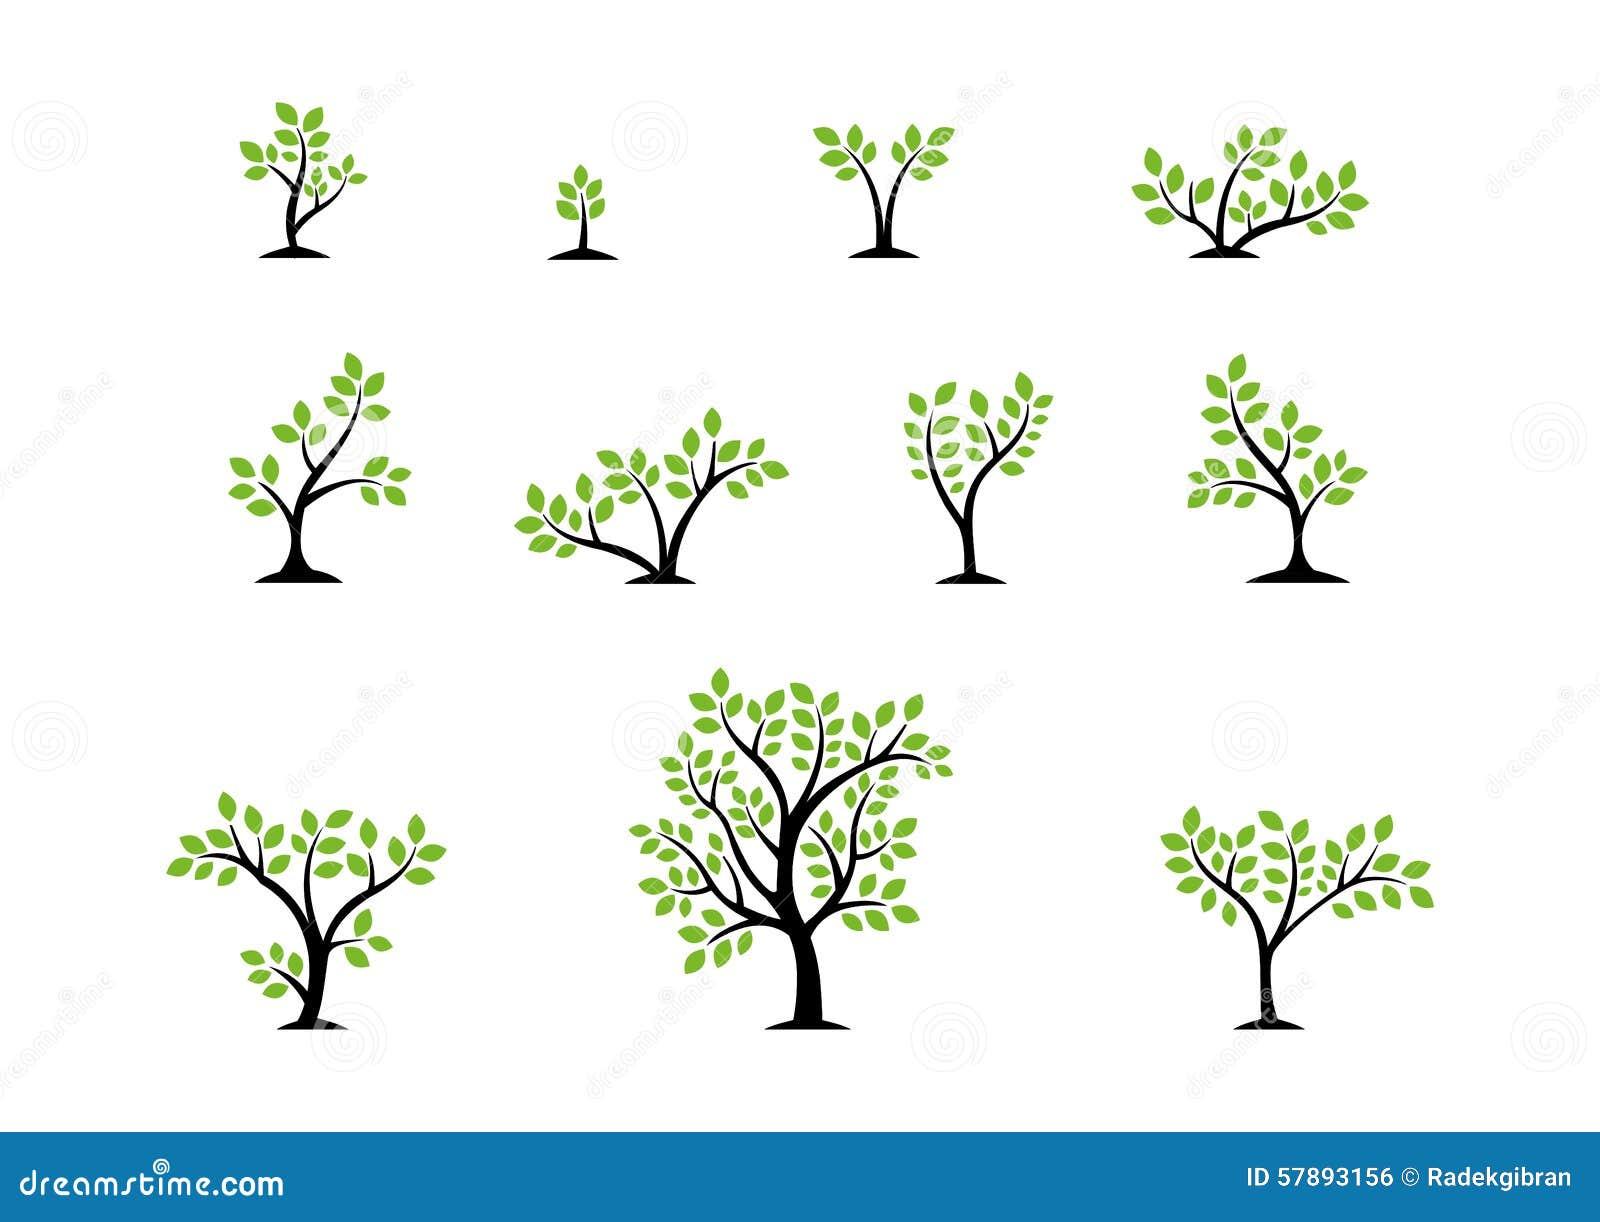 Tree logo concept,set of trees nature wellness symbol icon design vector